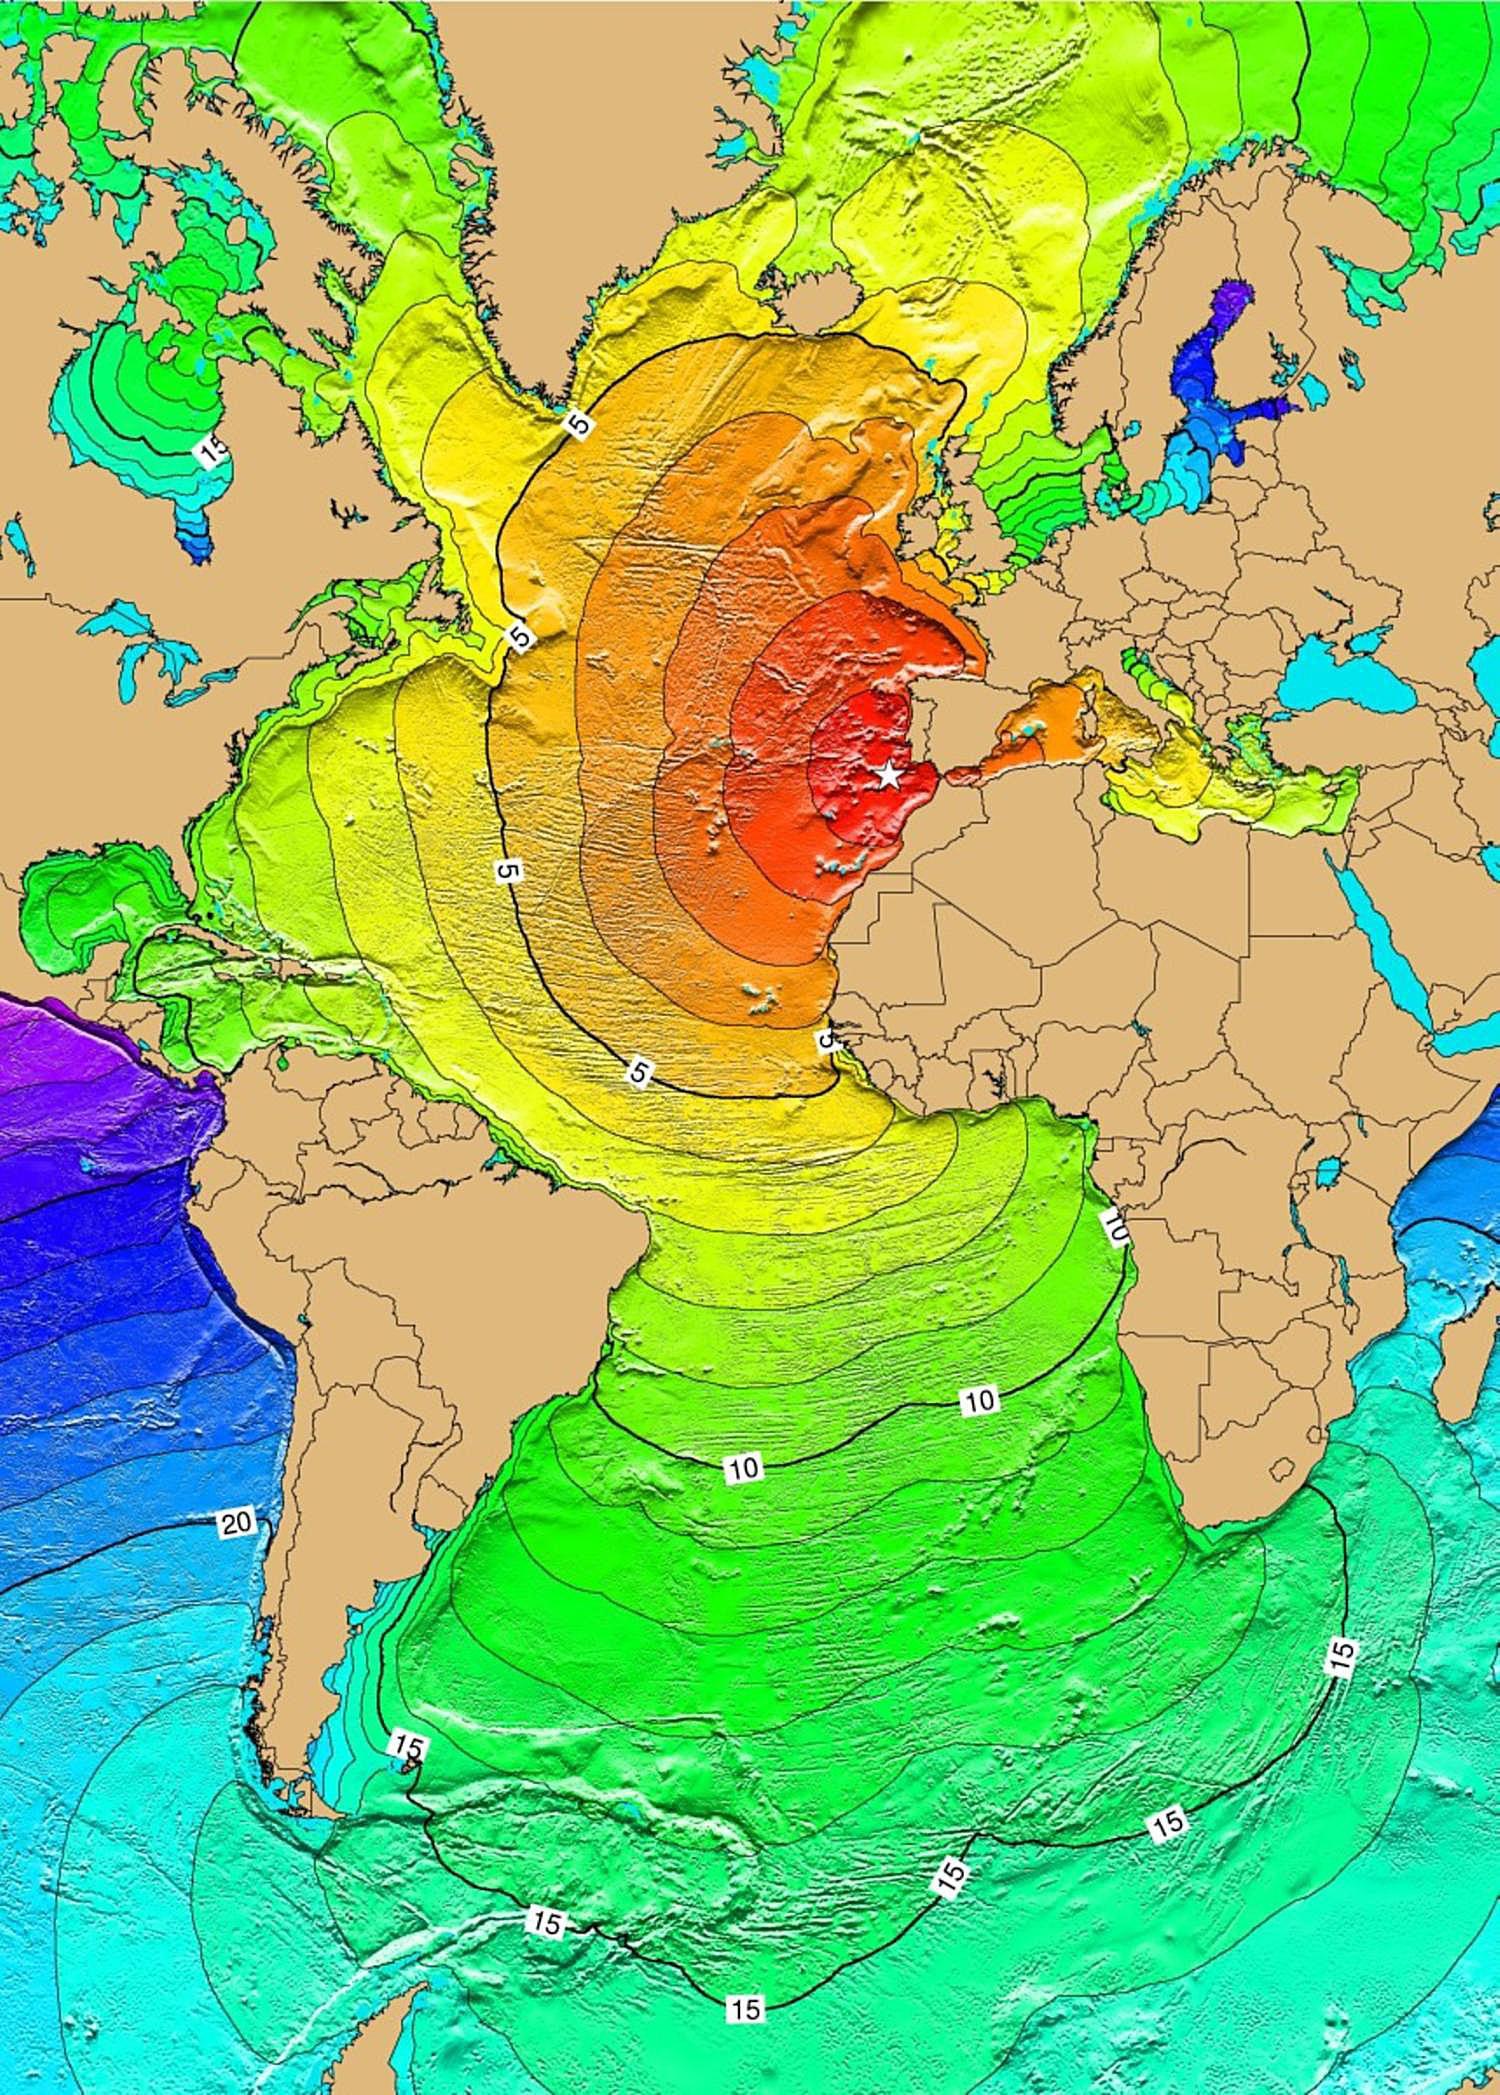 Tsunami travel time for 1755 Portugal earthquake.